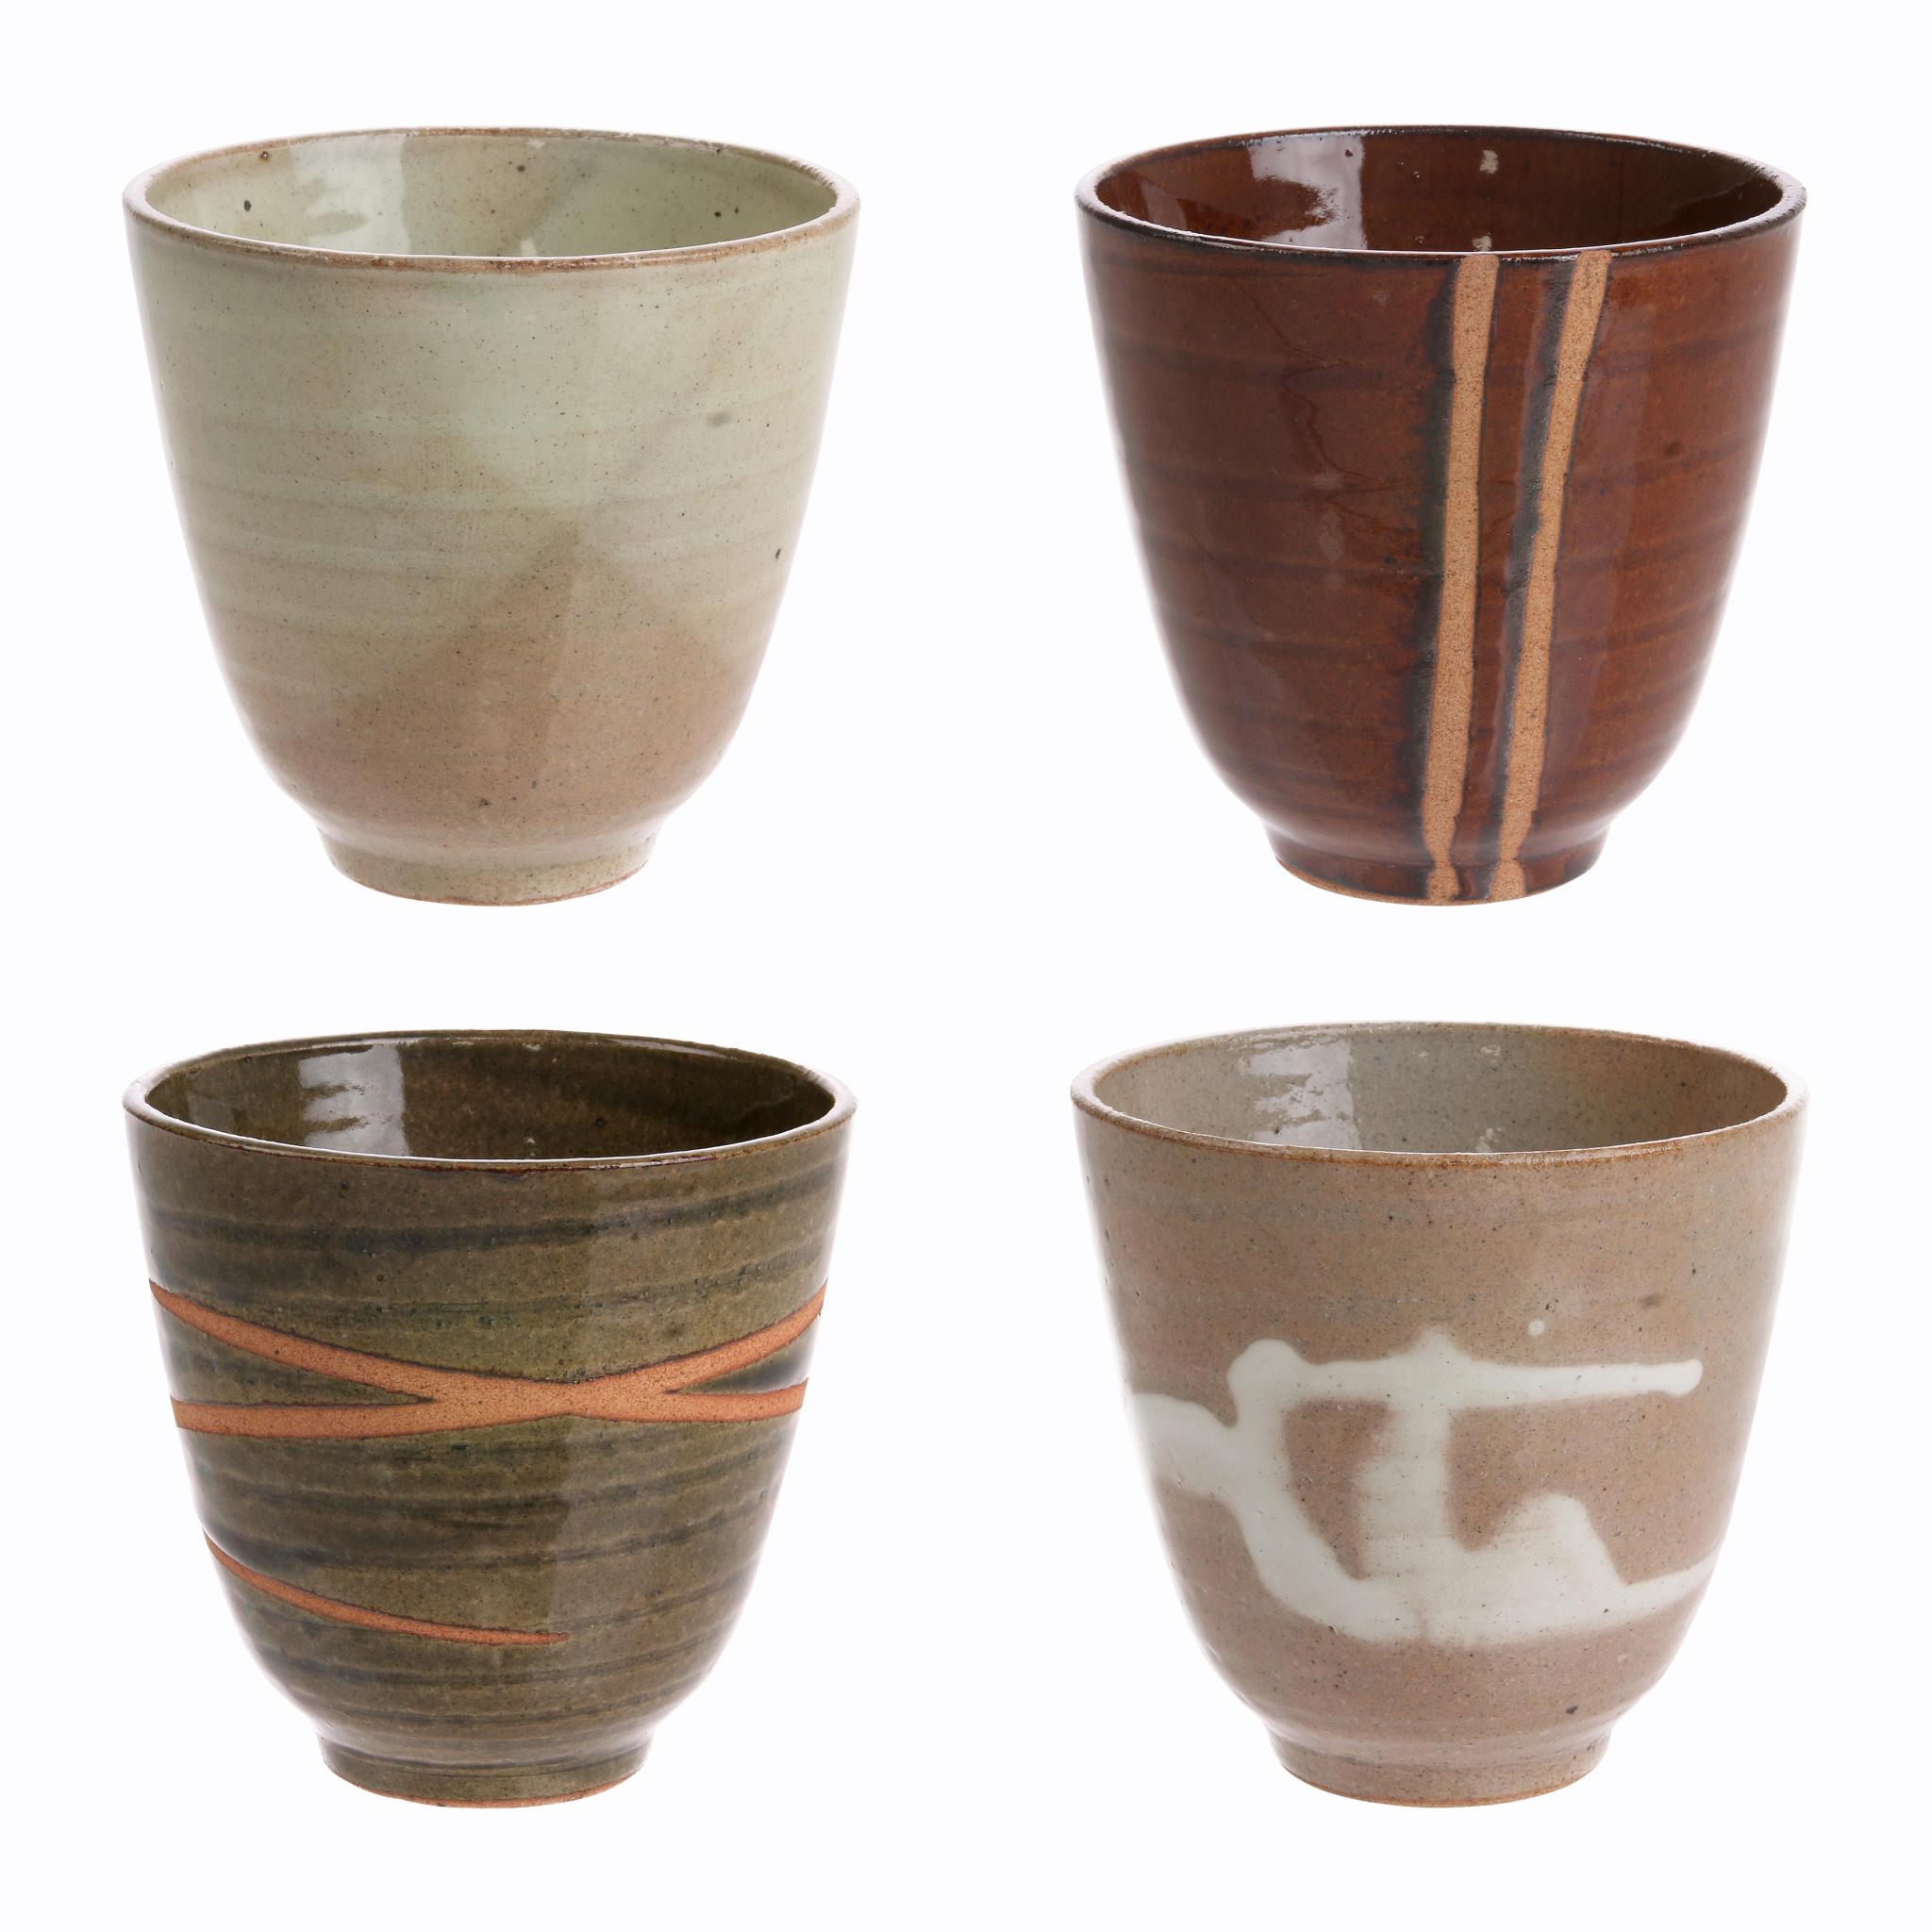 Mok kyoto ceramics: japanese yunomi mugs bruin-2